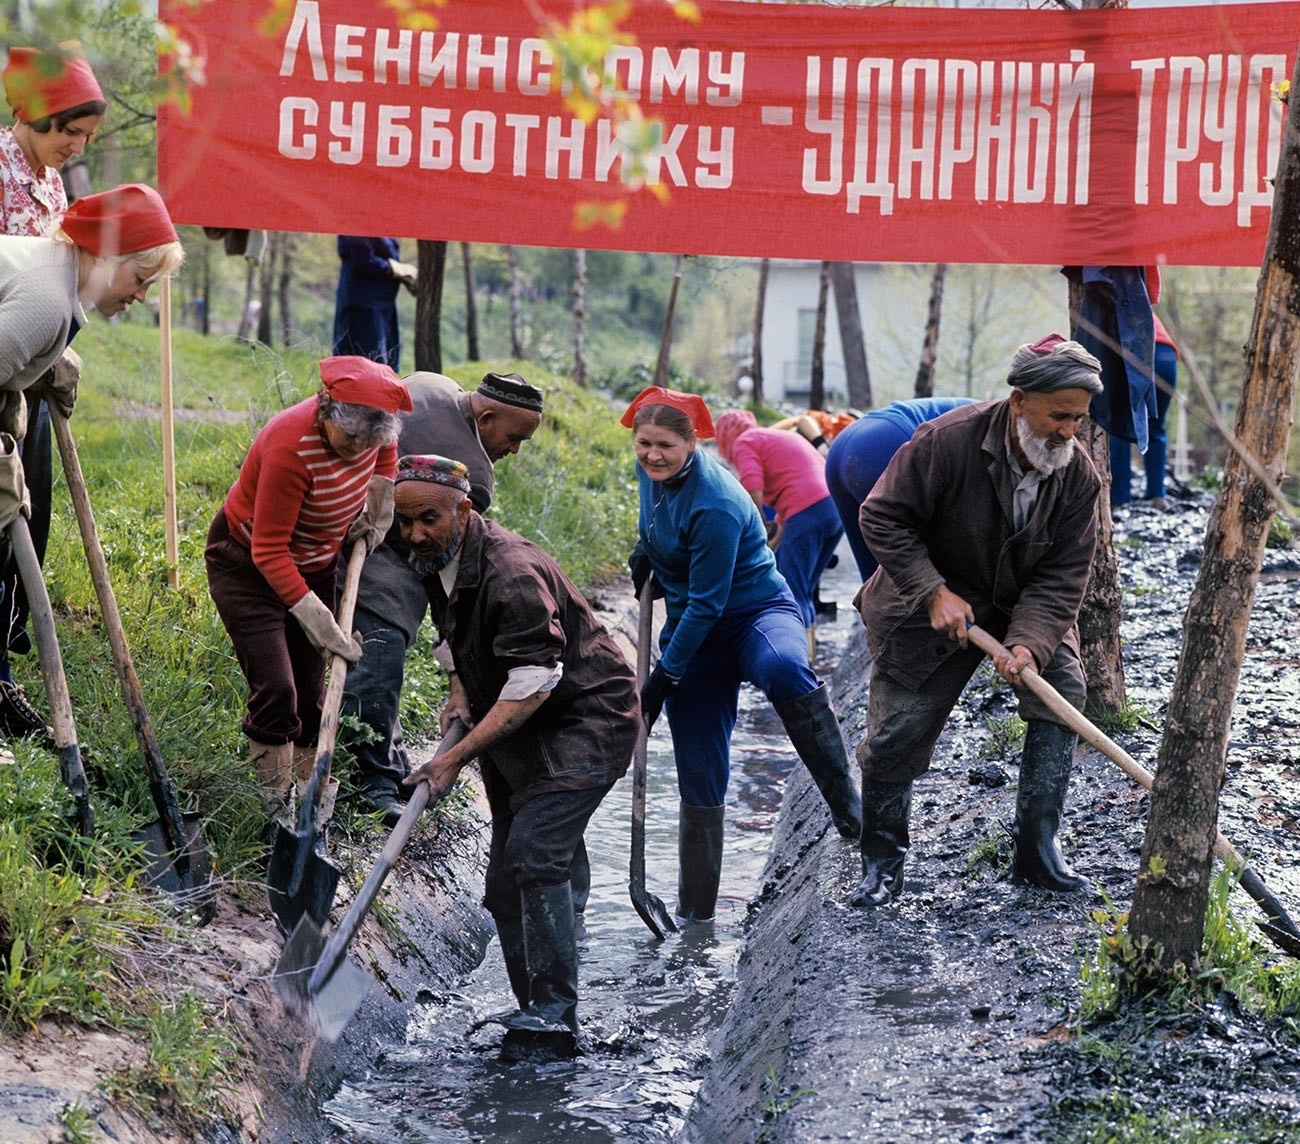 Penduduk kota melakukan subbotnik komunis Lenin.